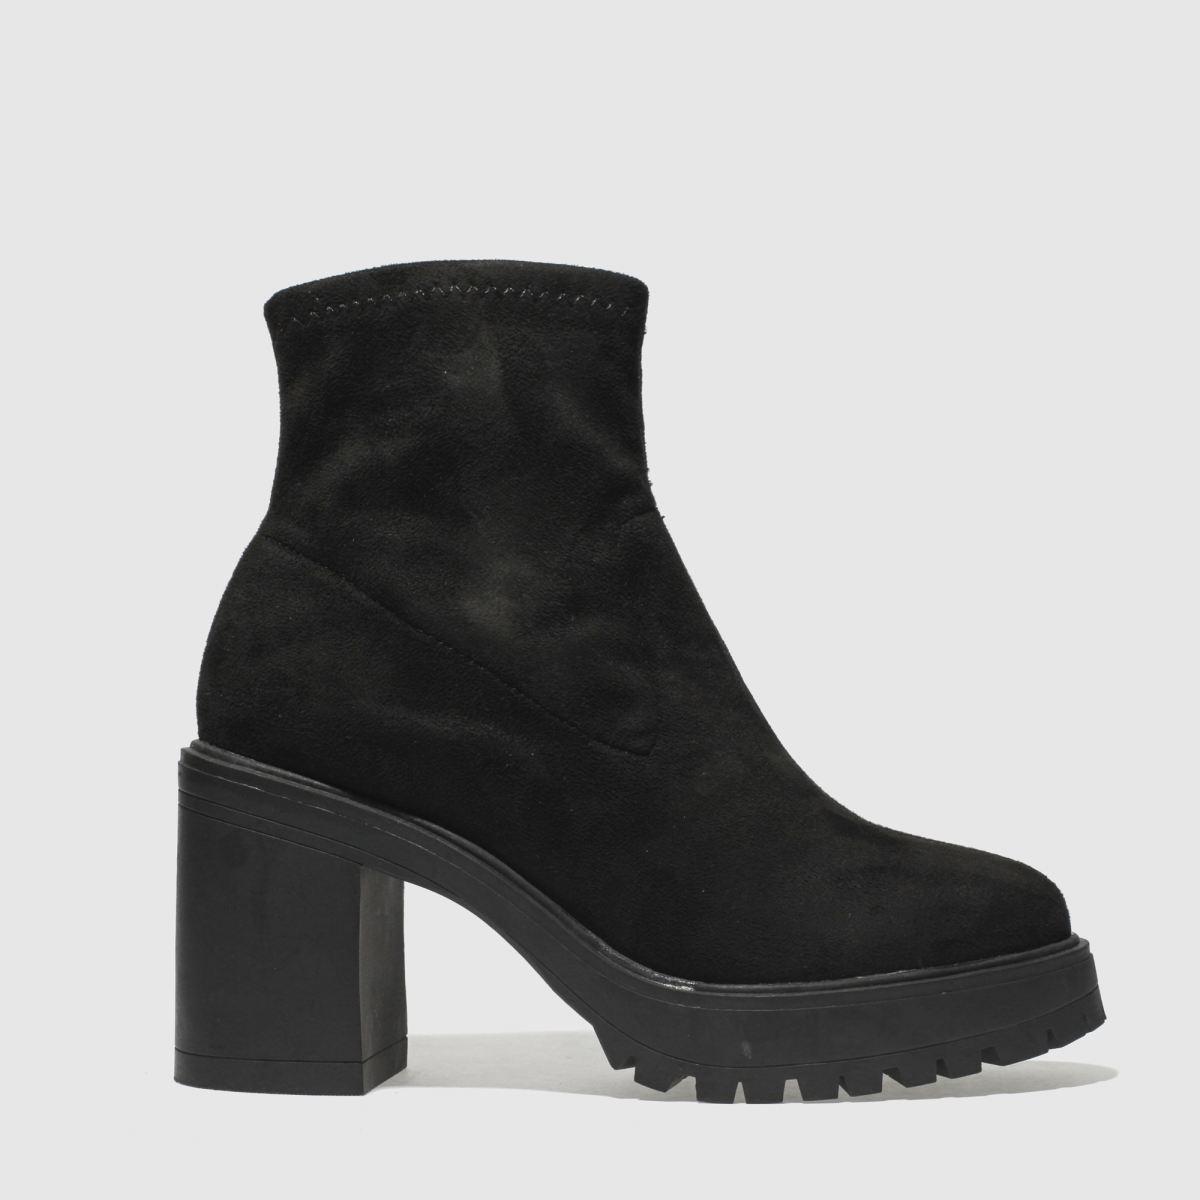 Schuh Black Splendid Boots